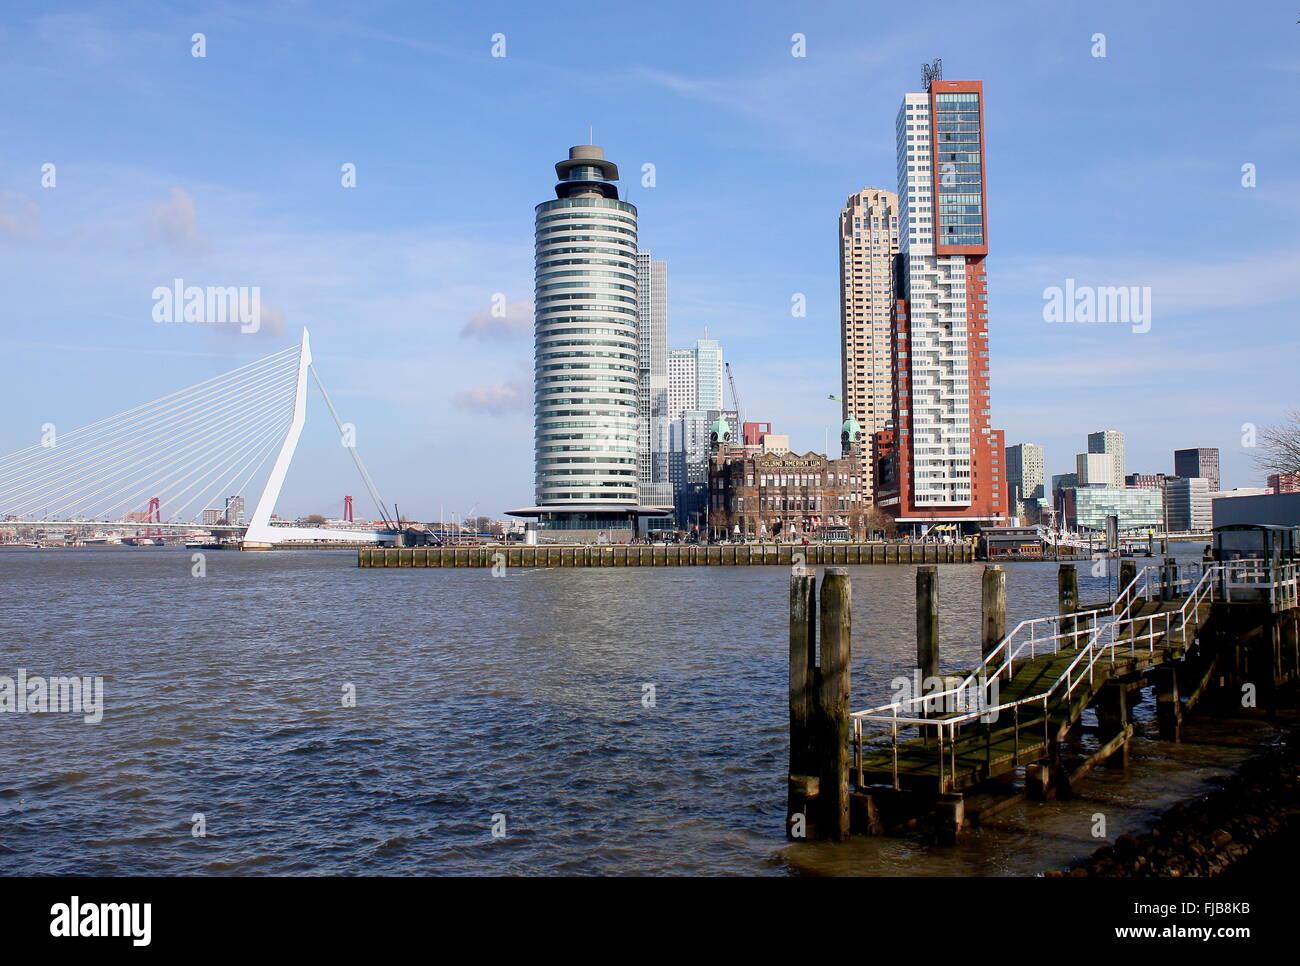 Skyline of Rotterdam, Netherlands. Erasmus bridge, World Port Center, Hotel New York, Montevideo tower on Kop van - Stock Image